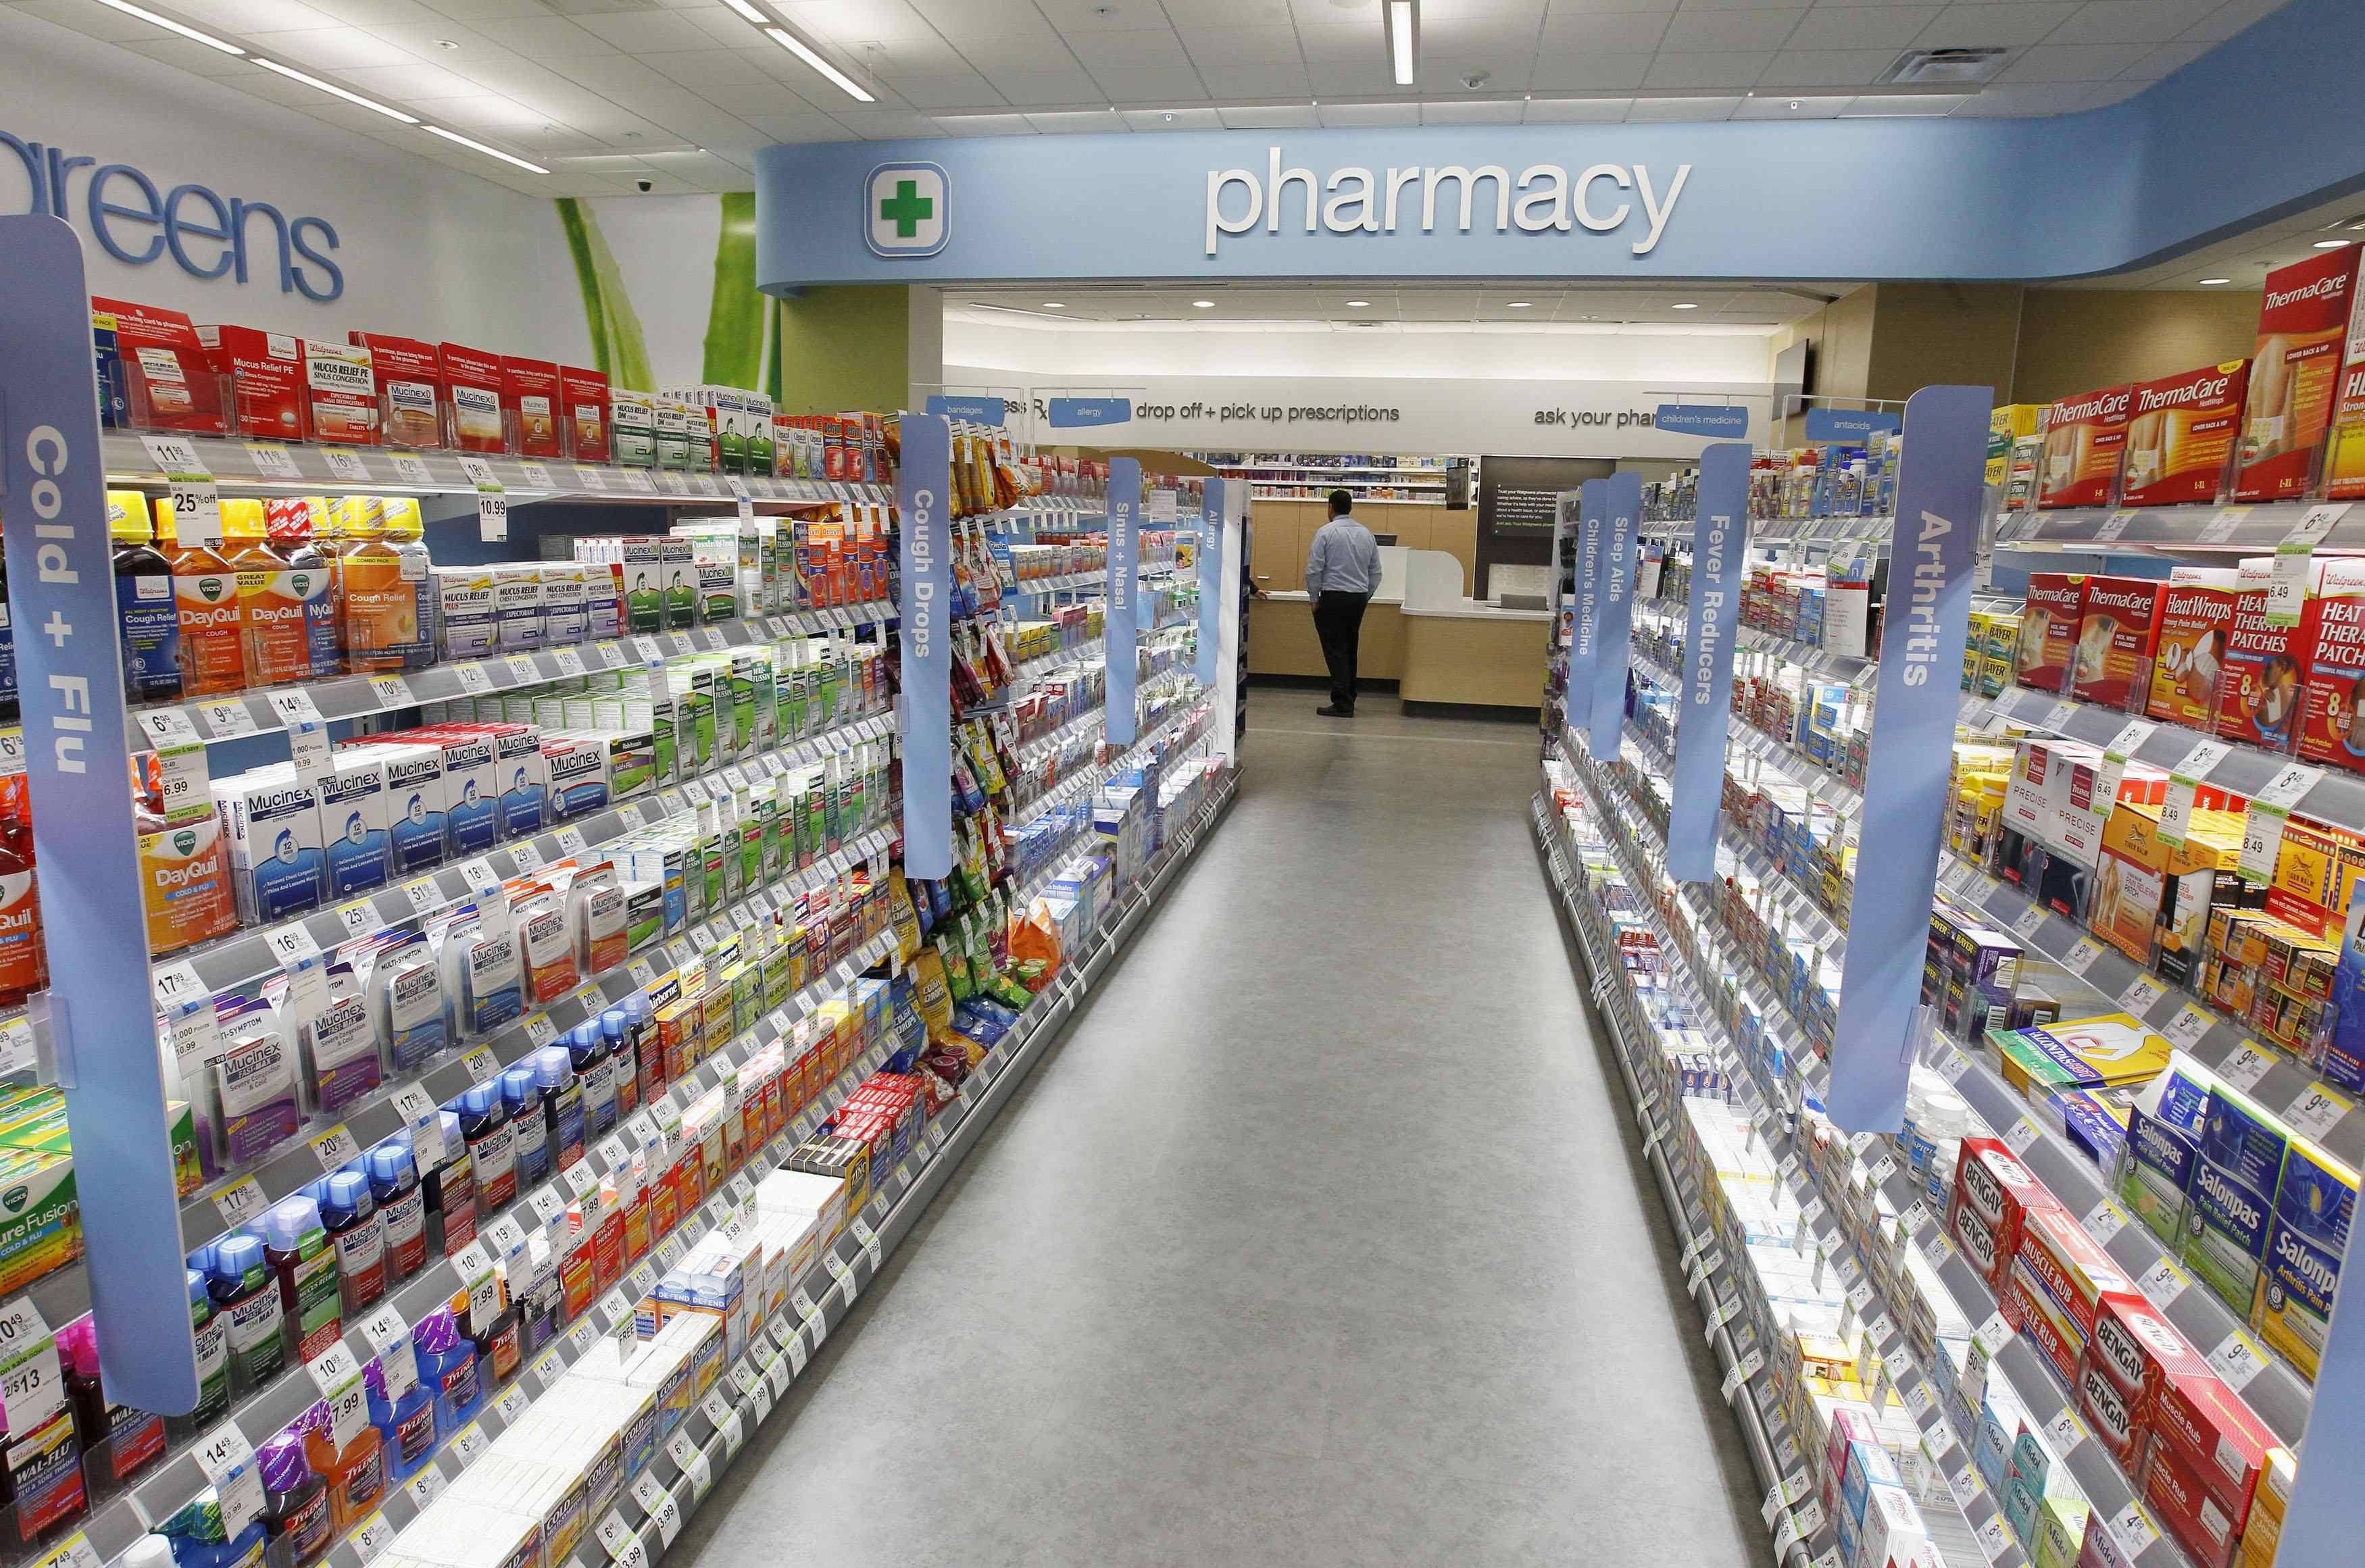 shoppers drug mart pharmacy - Google Search | *Wellness